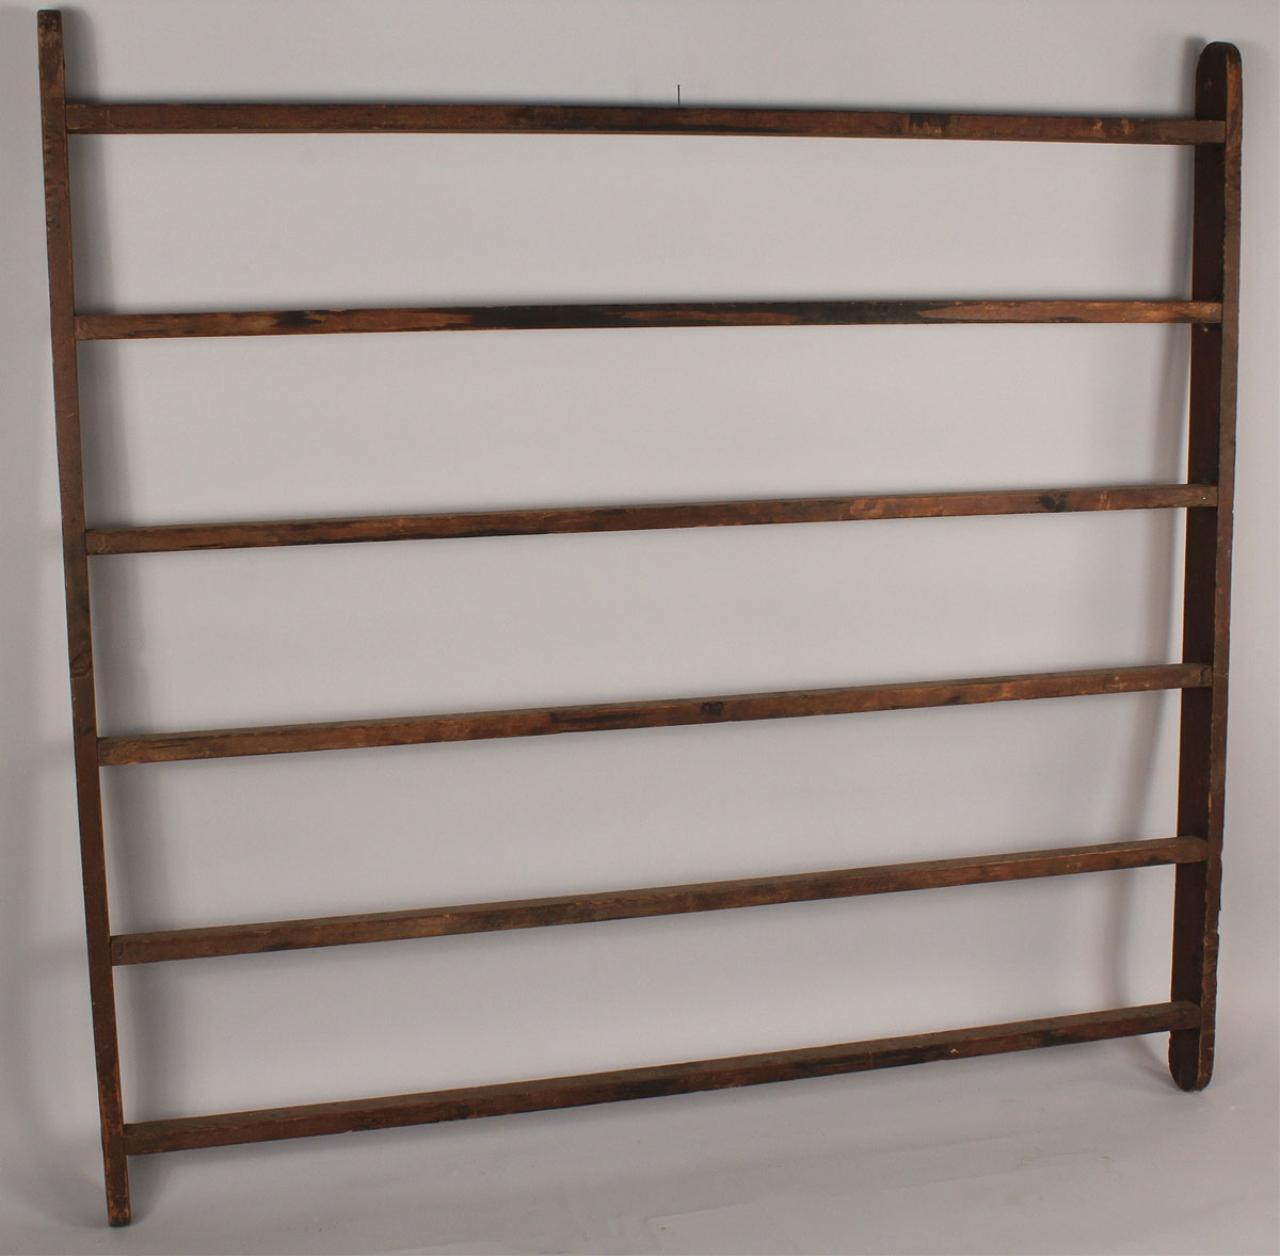 Lot 680 Antique Hanging Quilt Rack